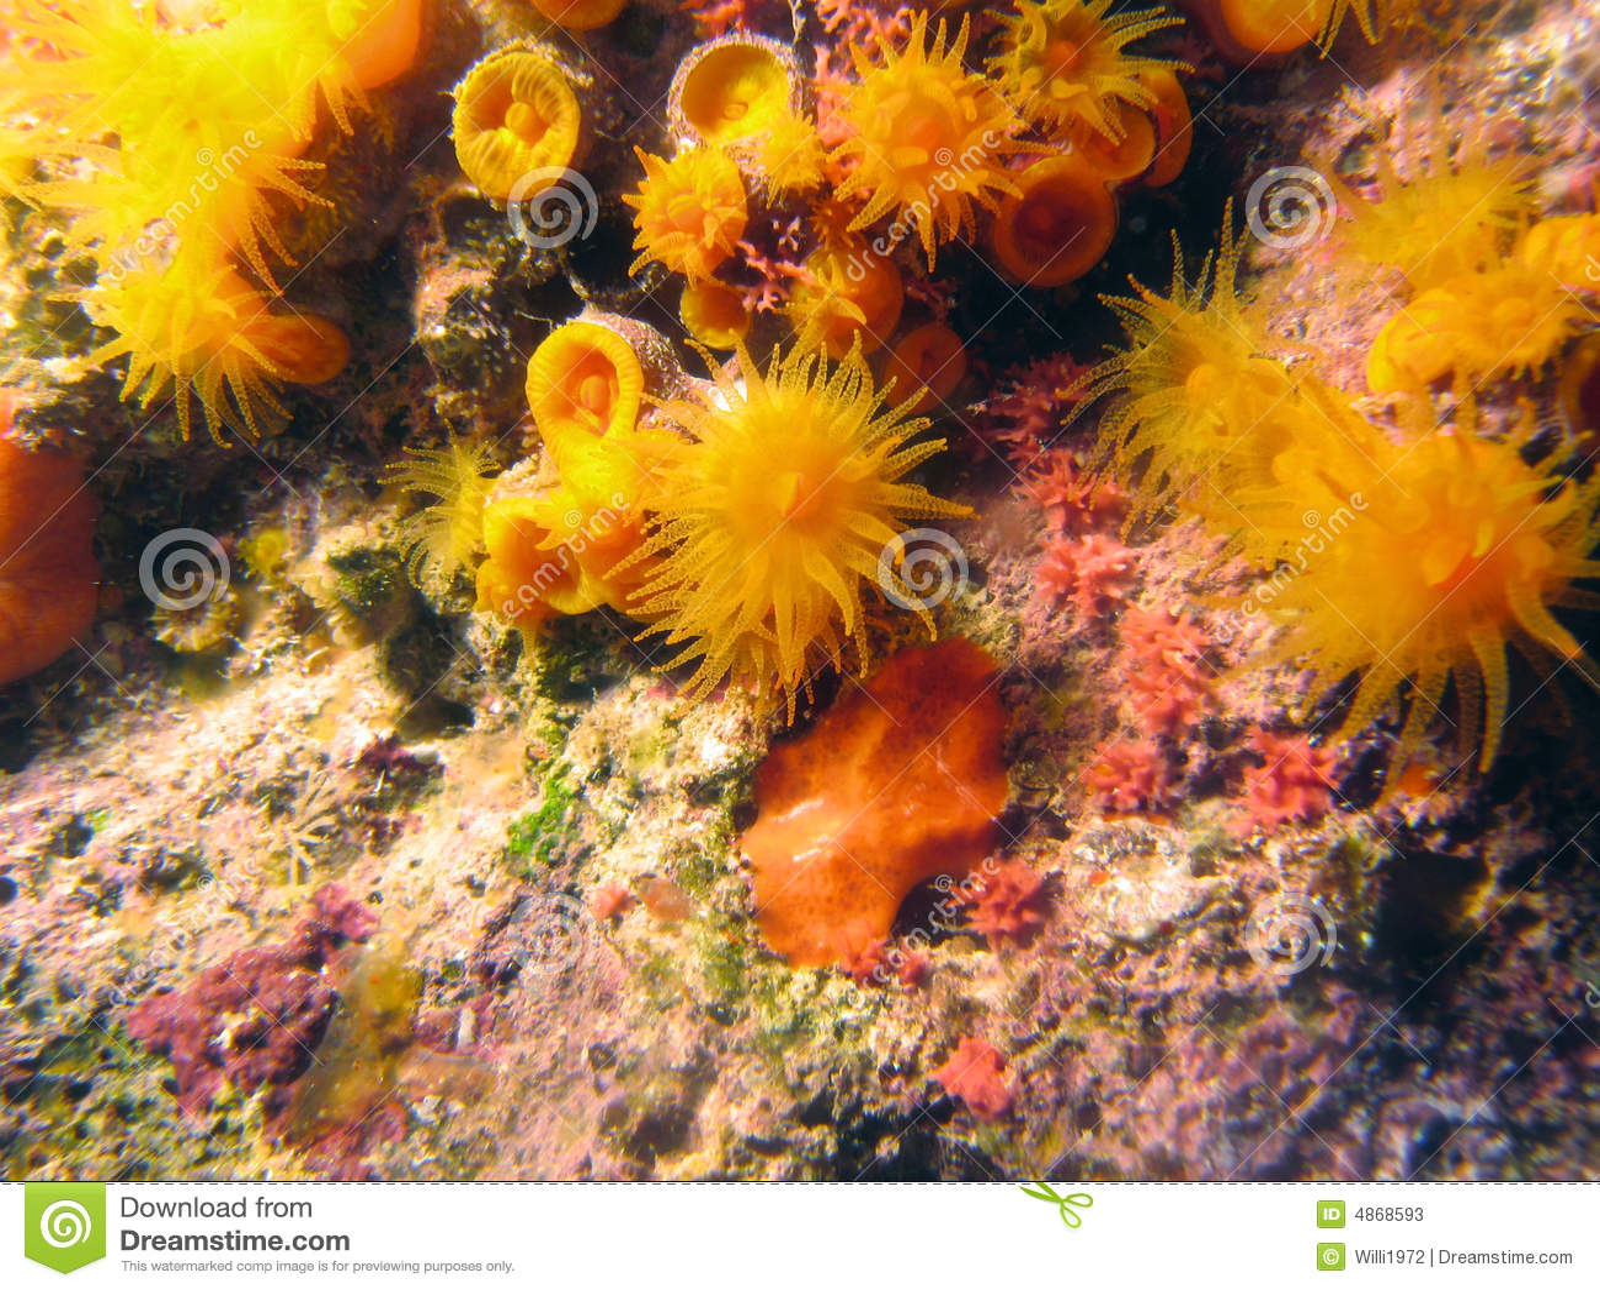 Orange star coral